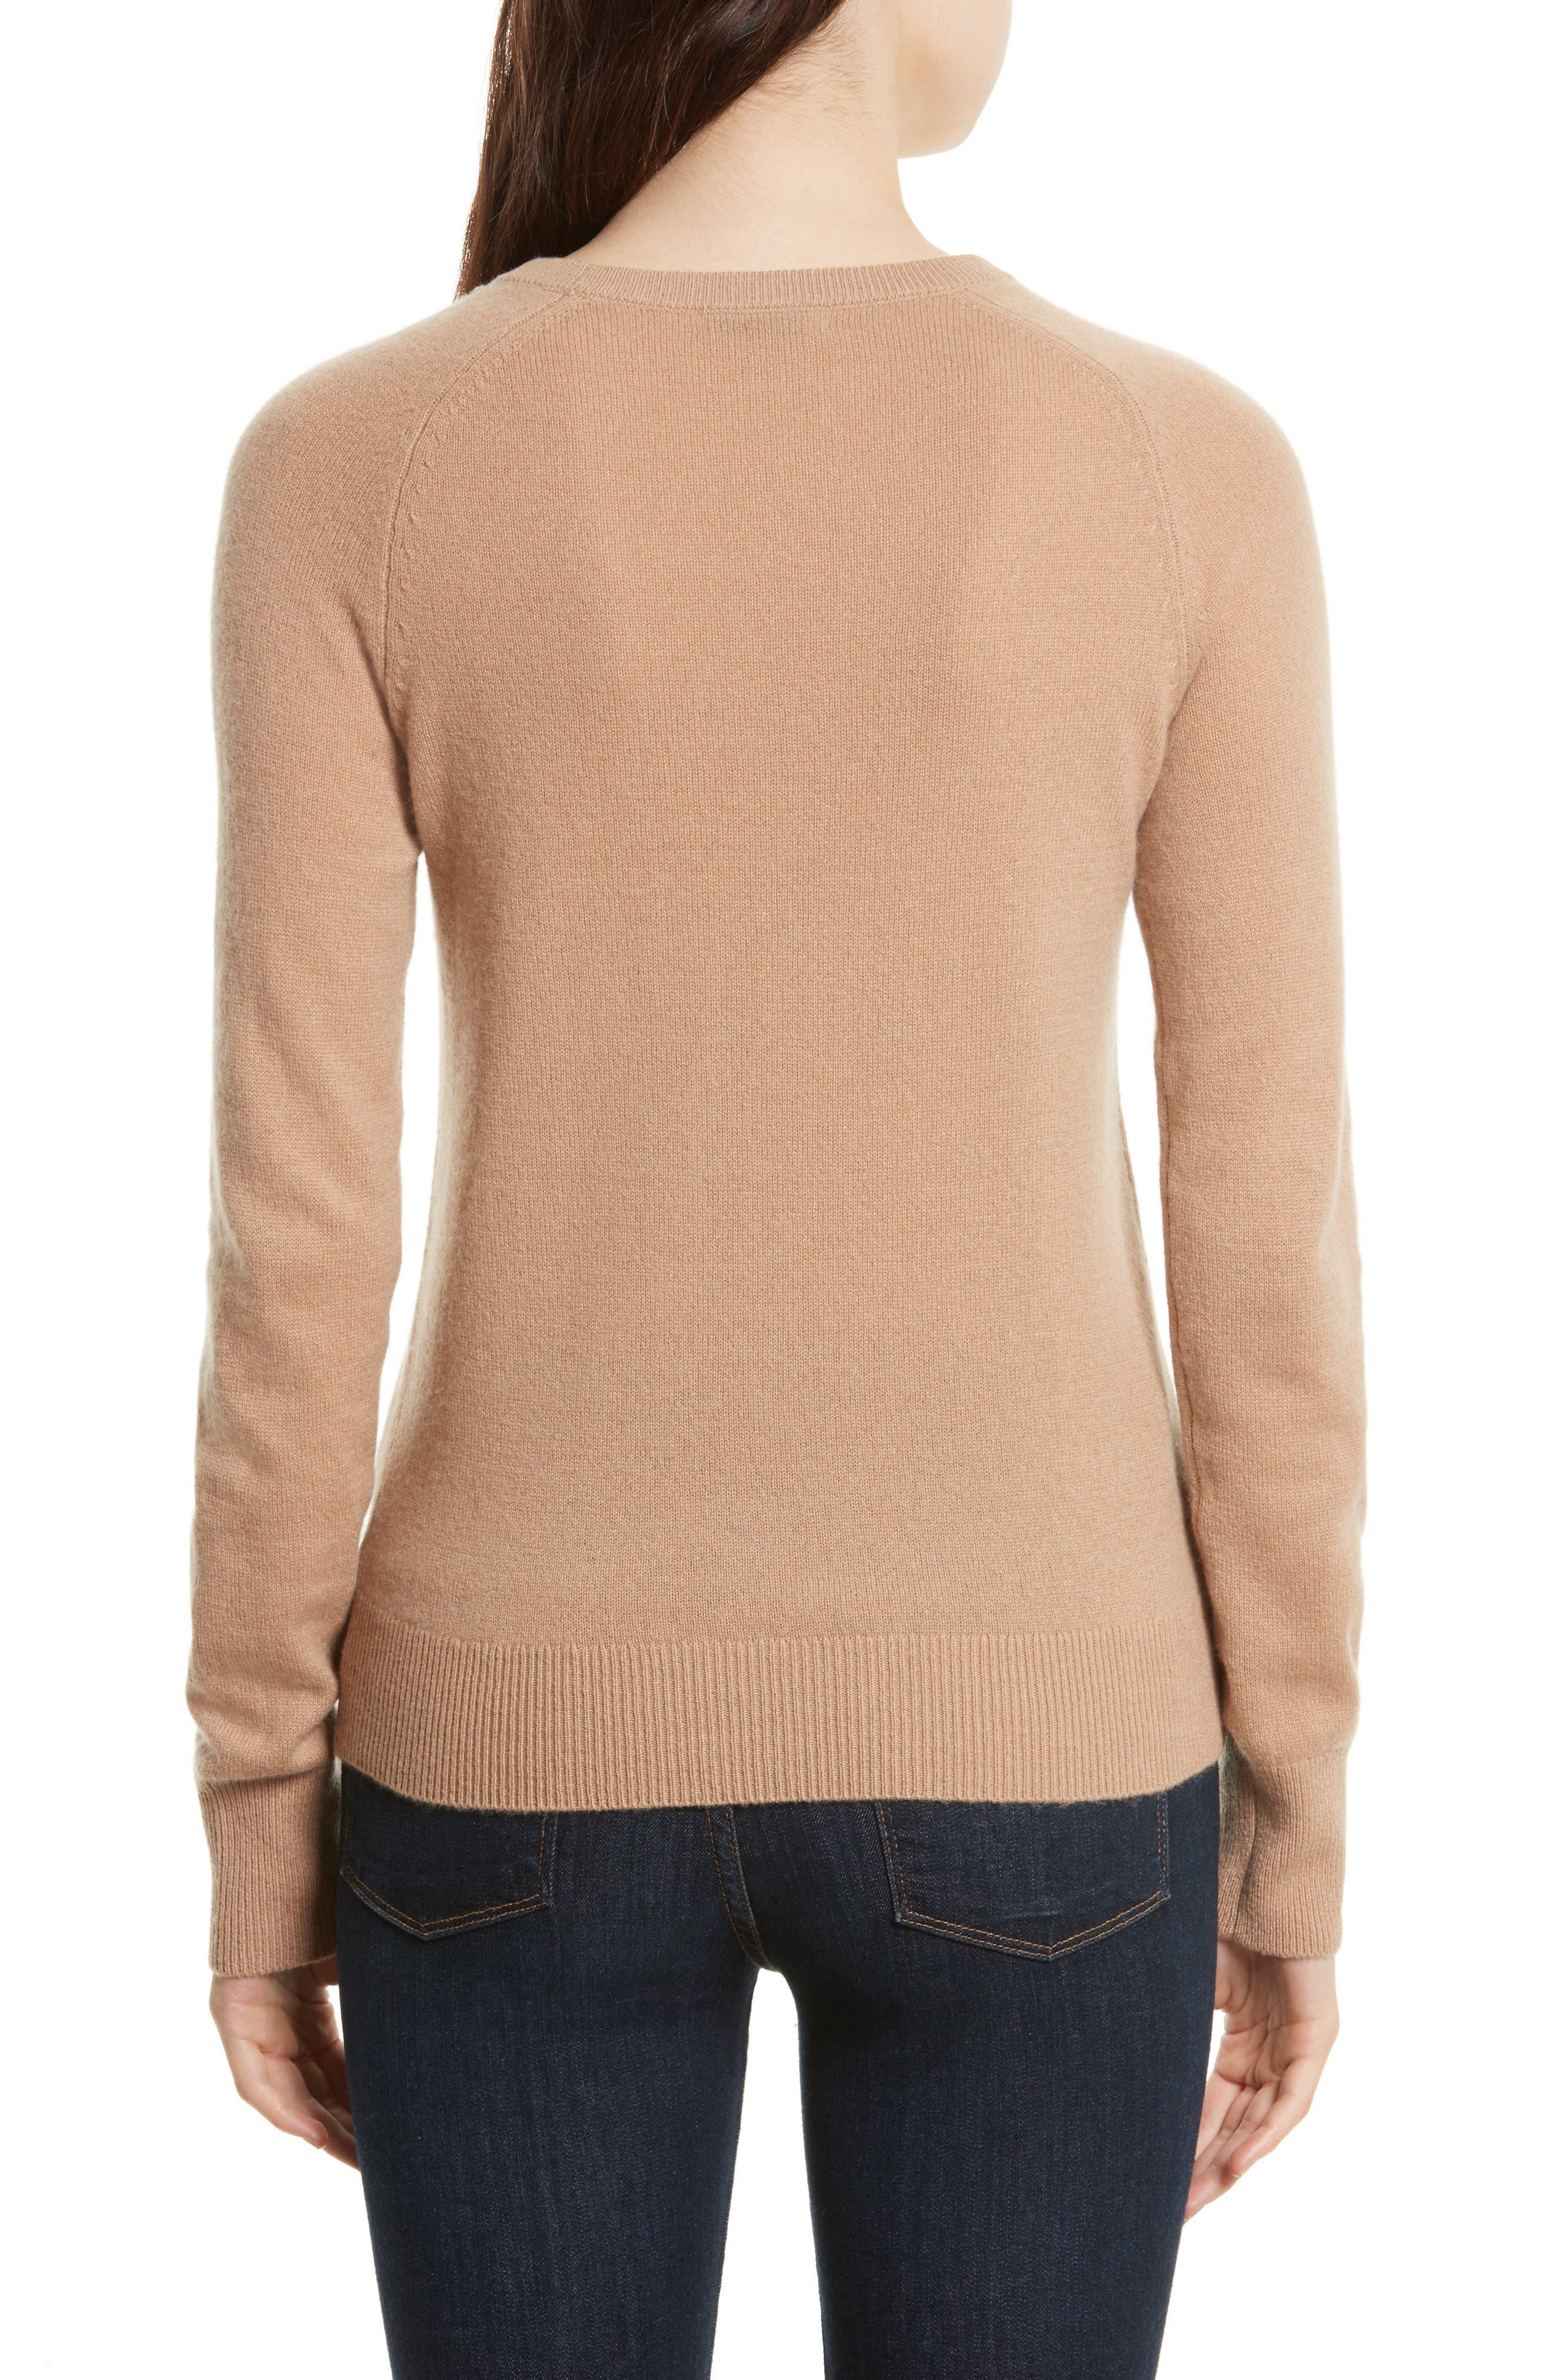 Alternate Image 2  - Equipment 'Sloane' Crewneck Cashmere Sweater